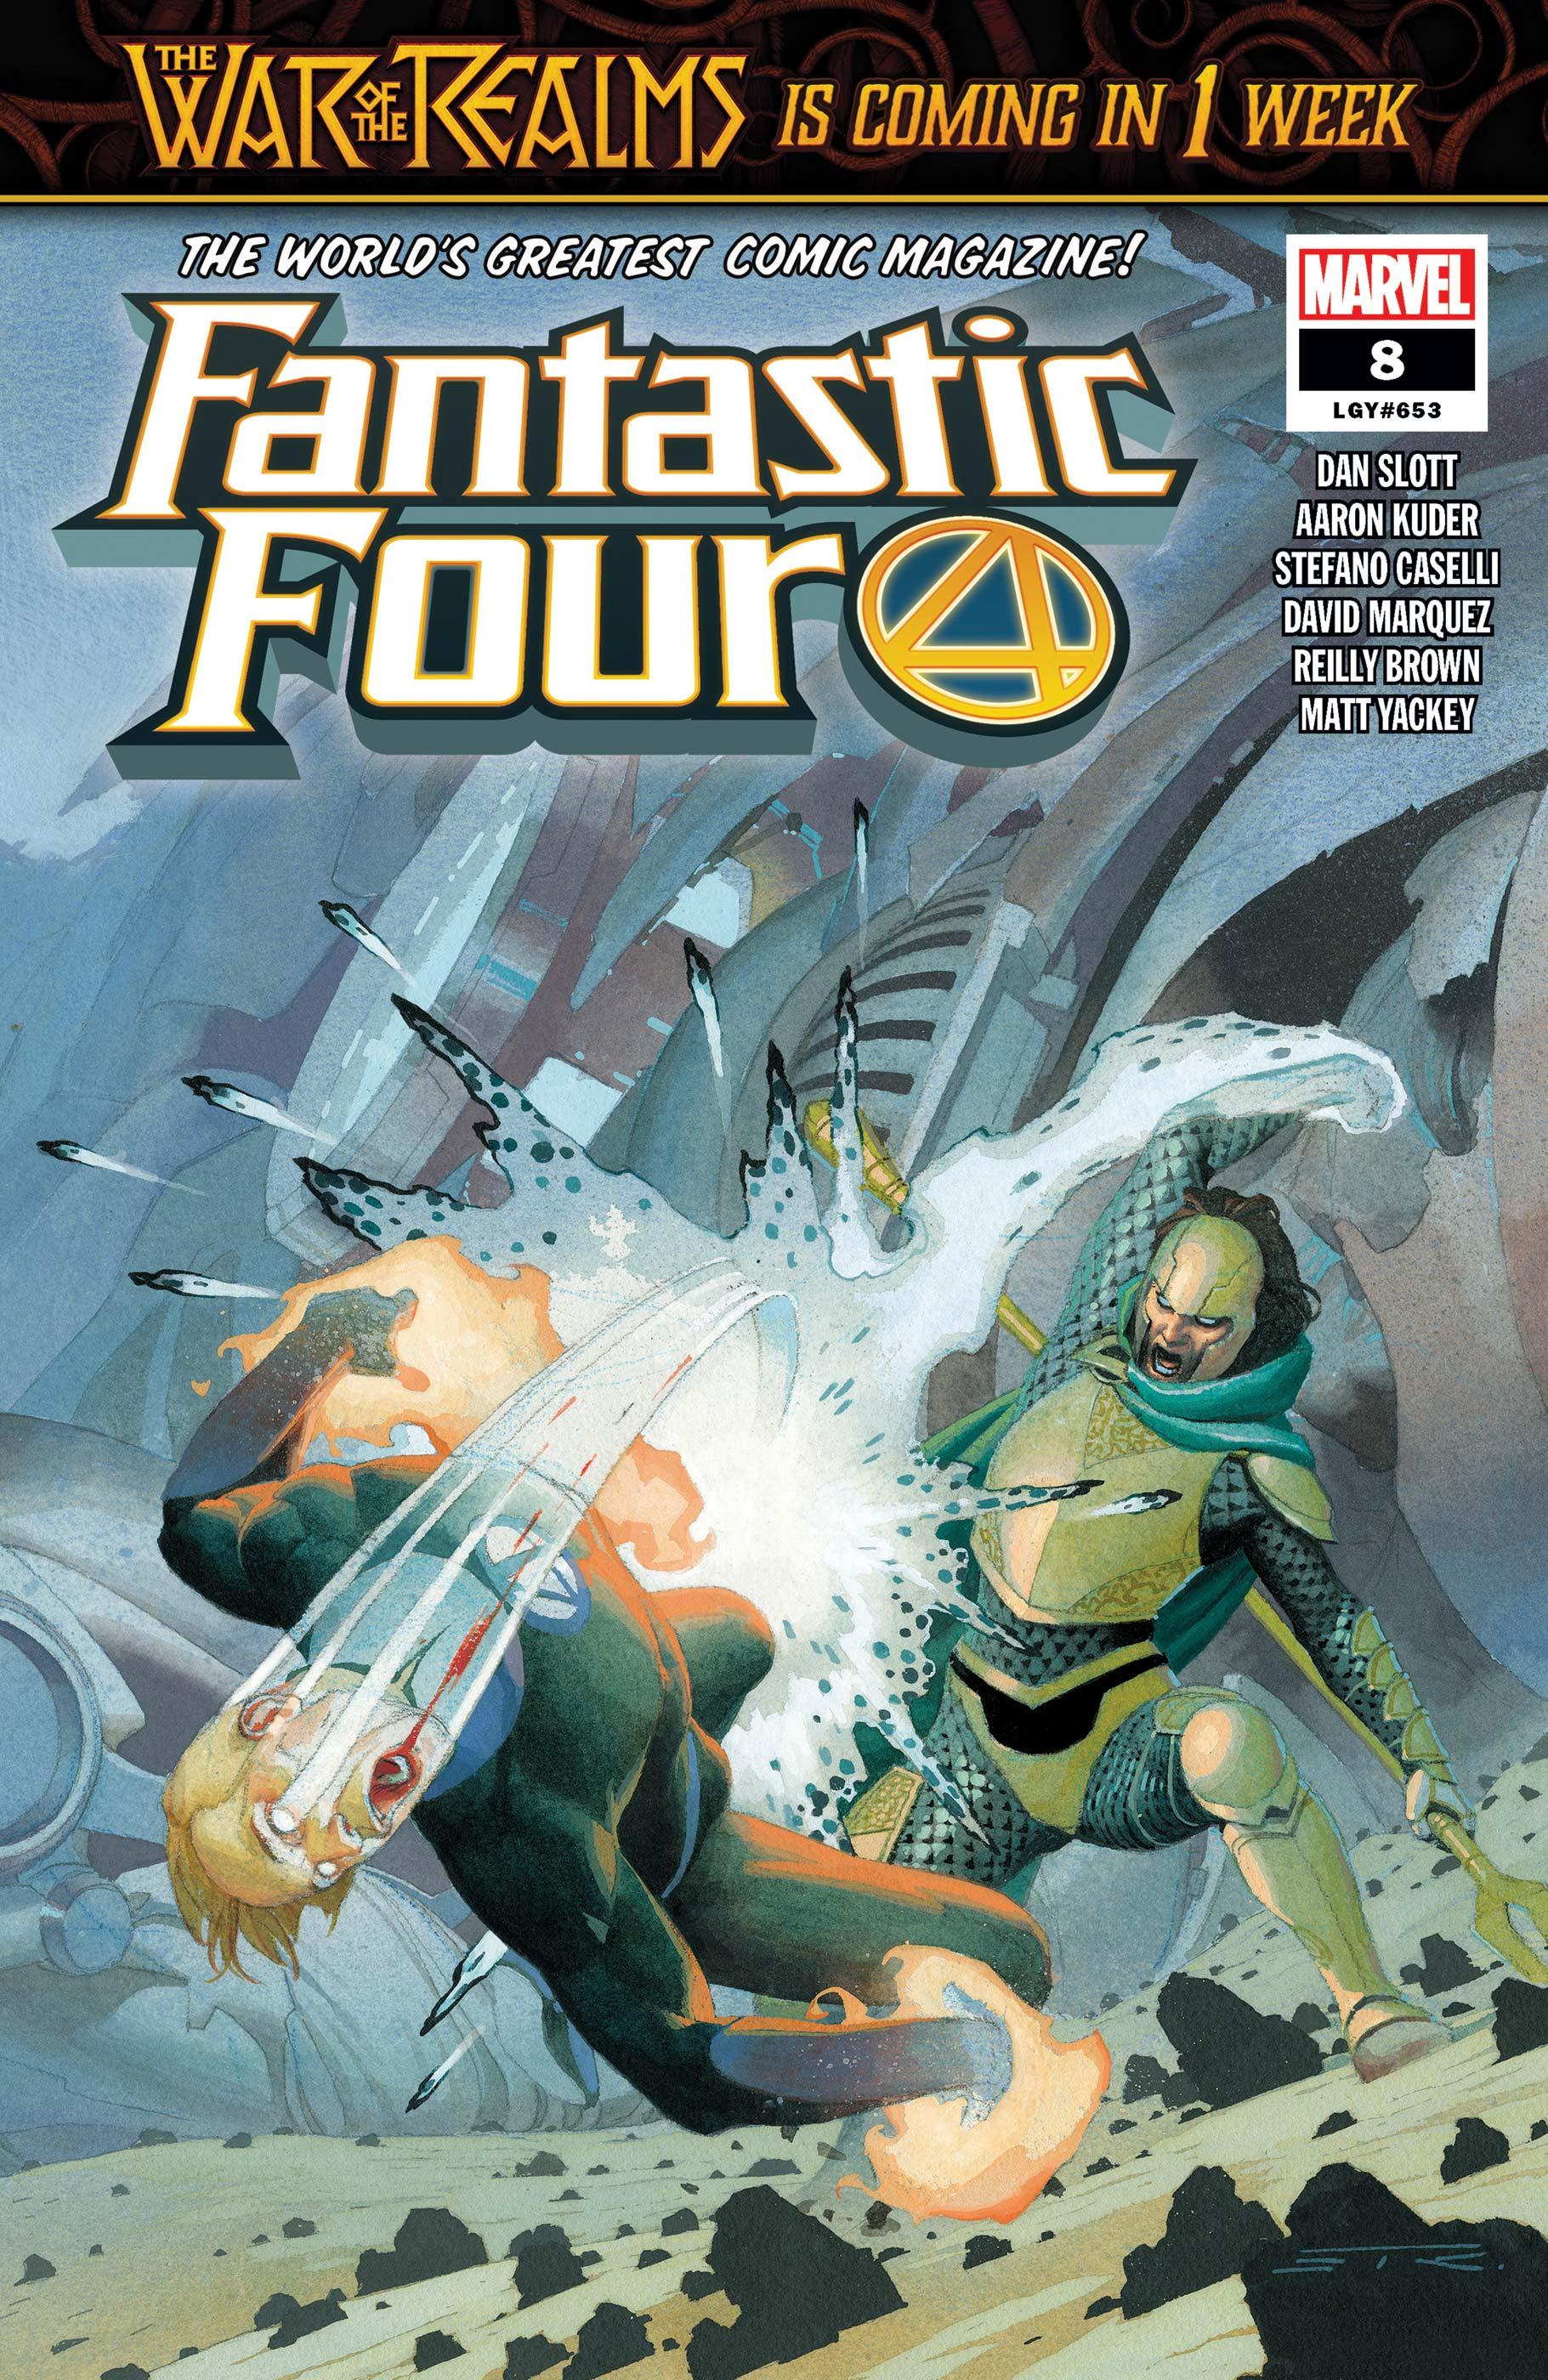 Fantastic Four (2018) #8